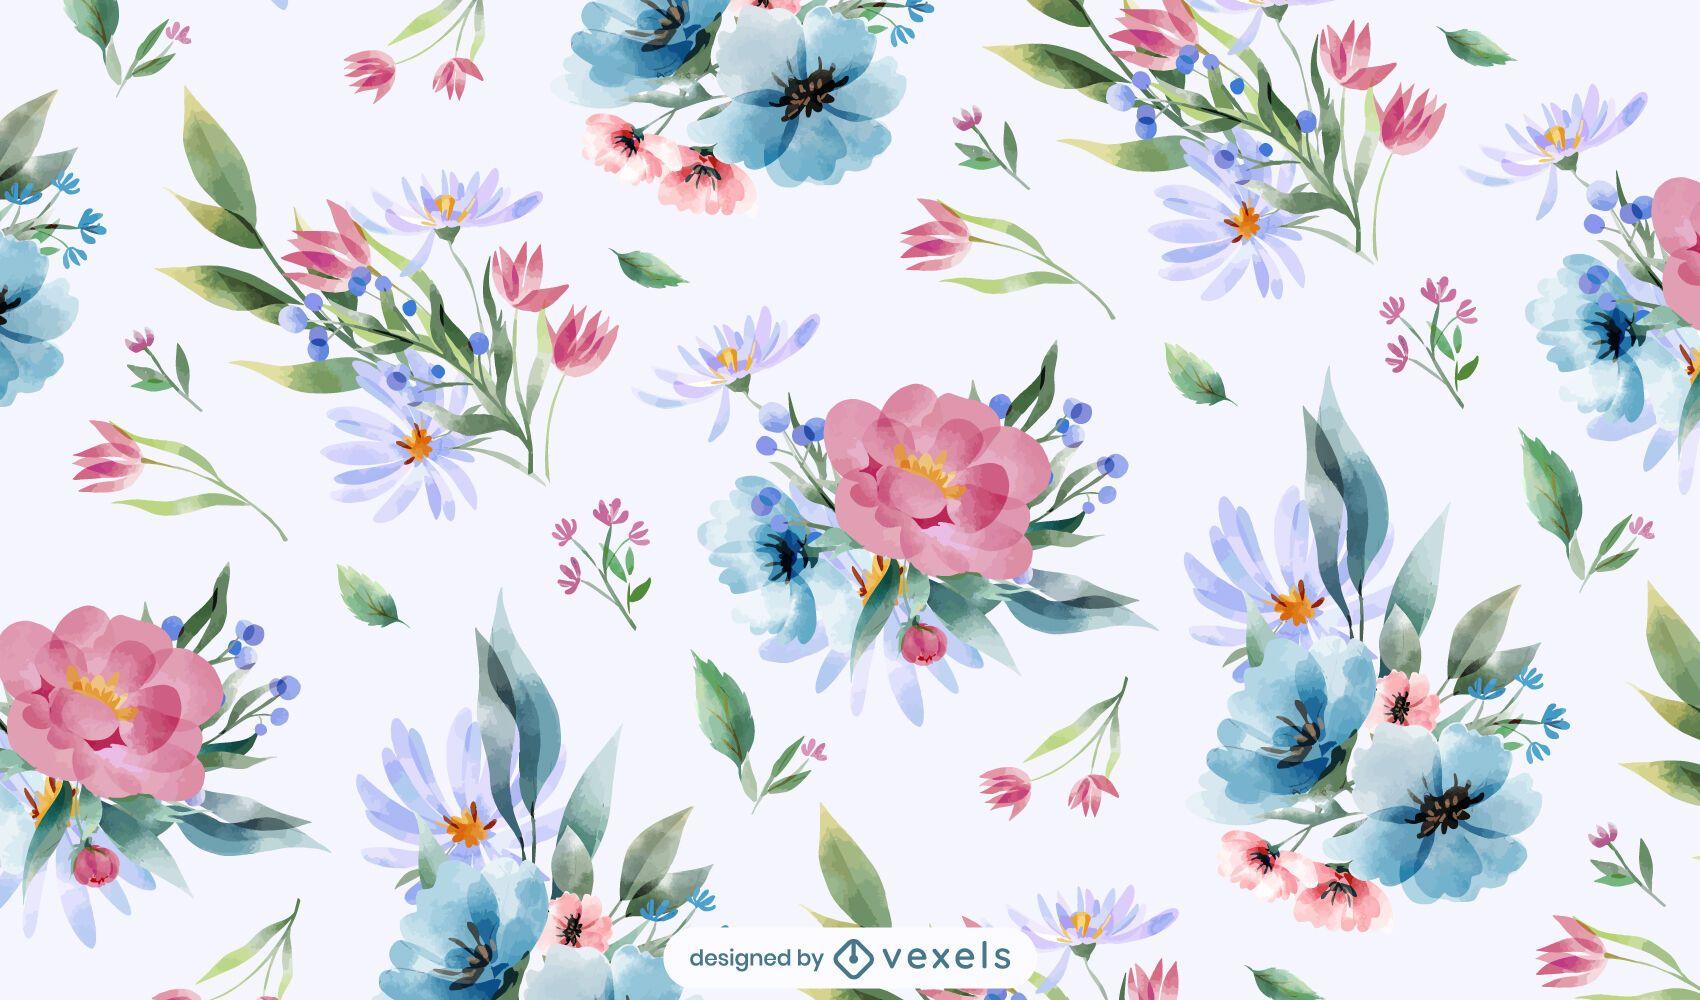 Spring watercolor flowers pattern design